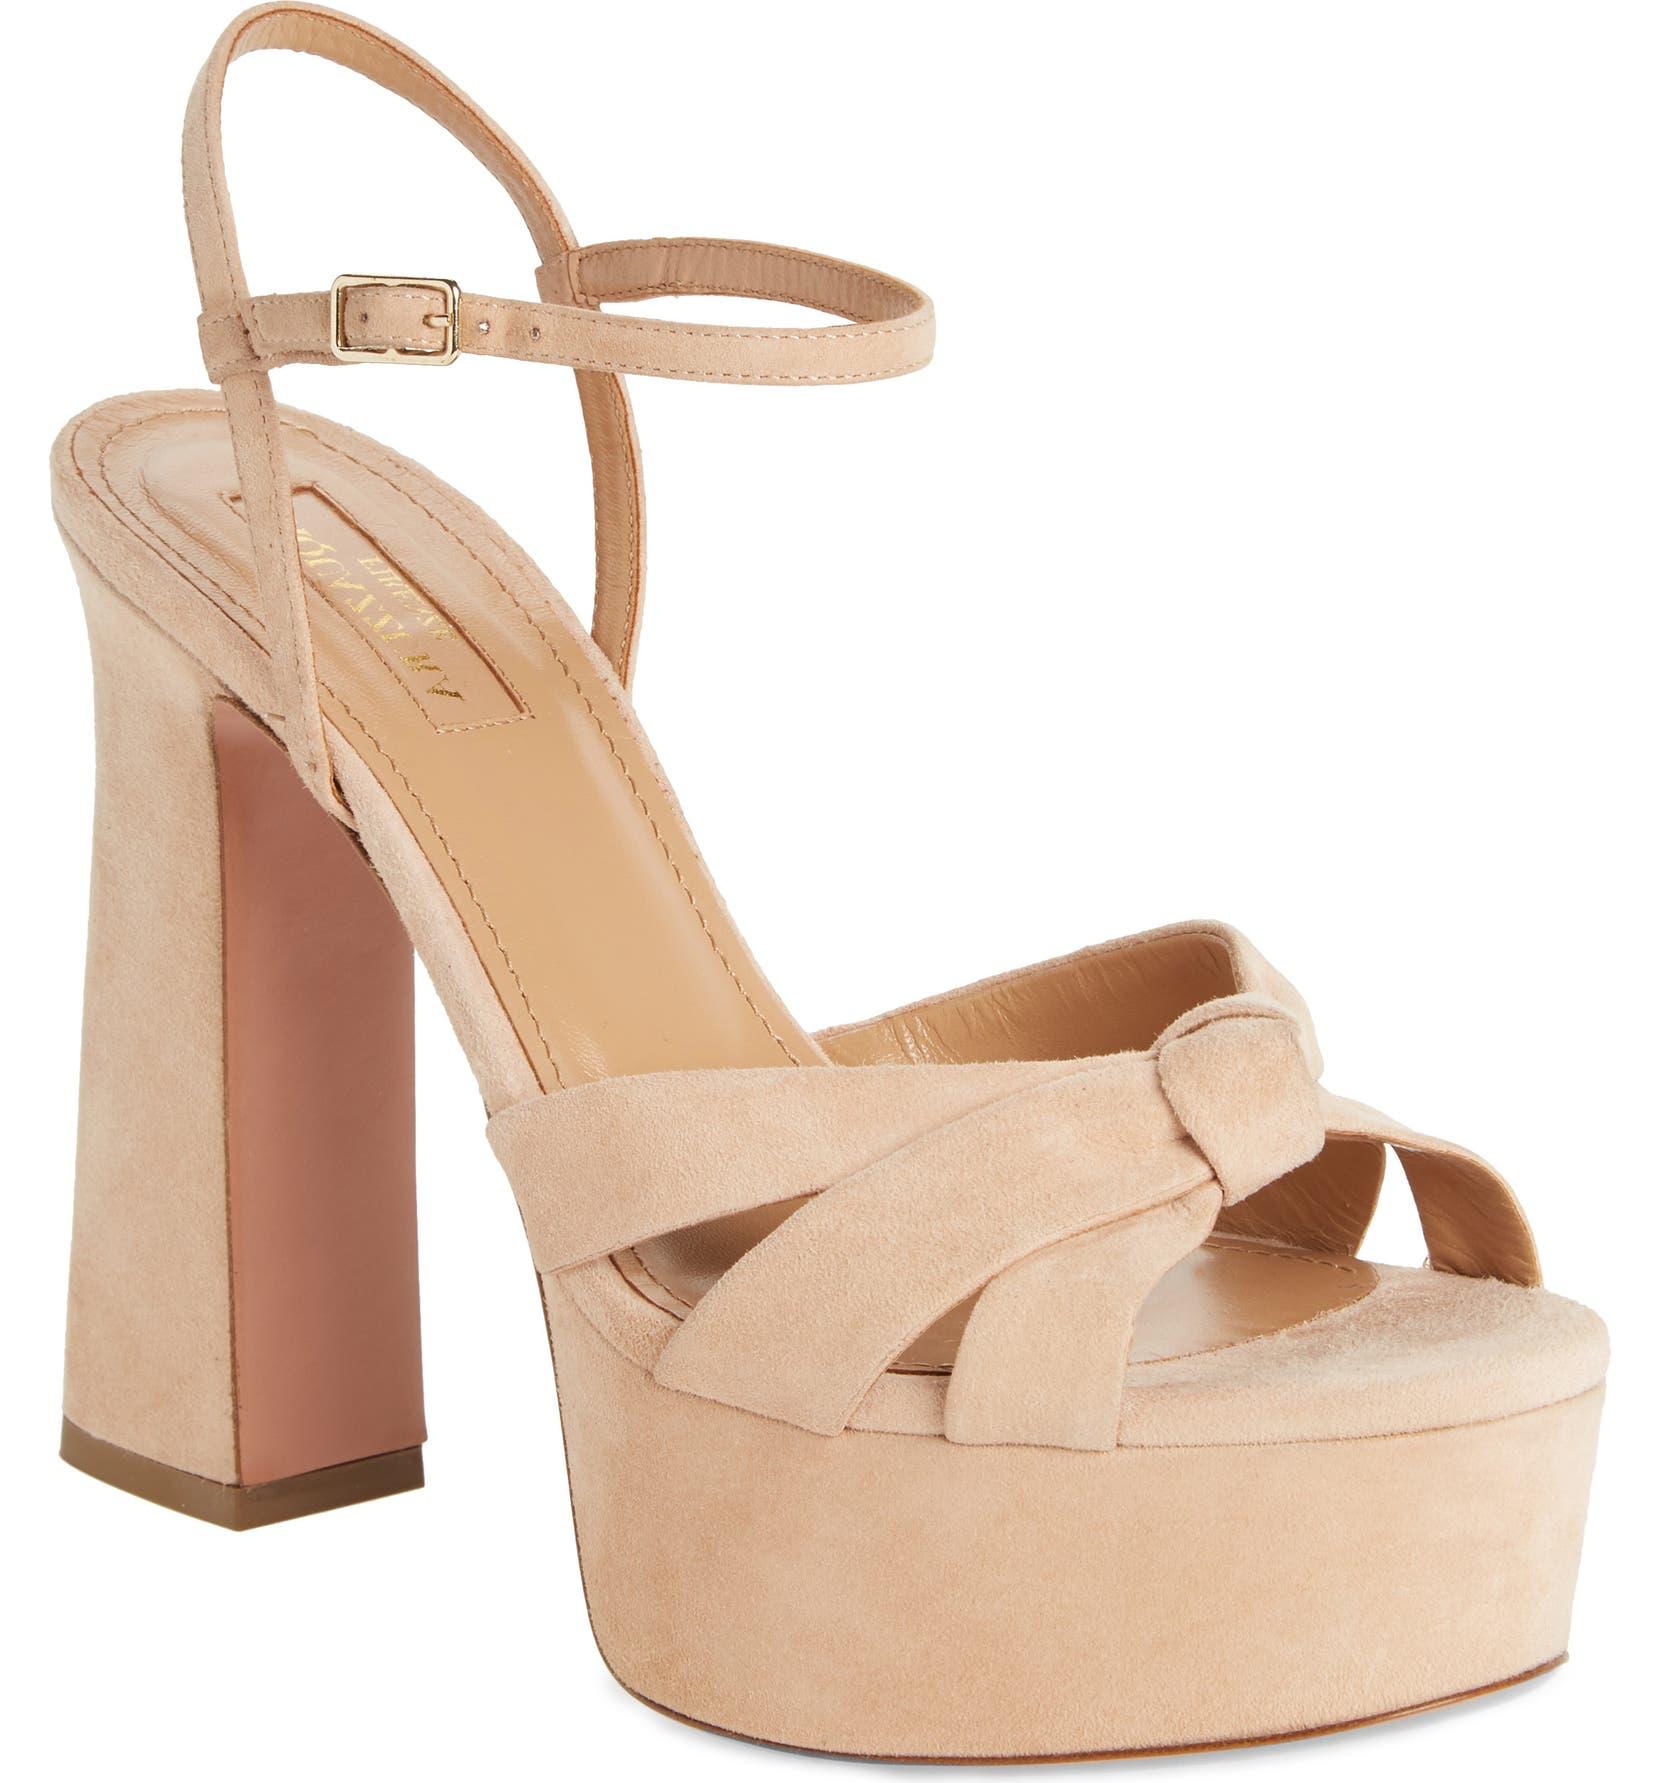 5a6fc5c8e34 Aquazzura Baba Platform Sandal (Women)